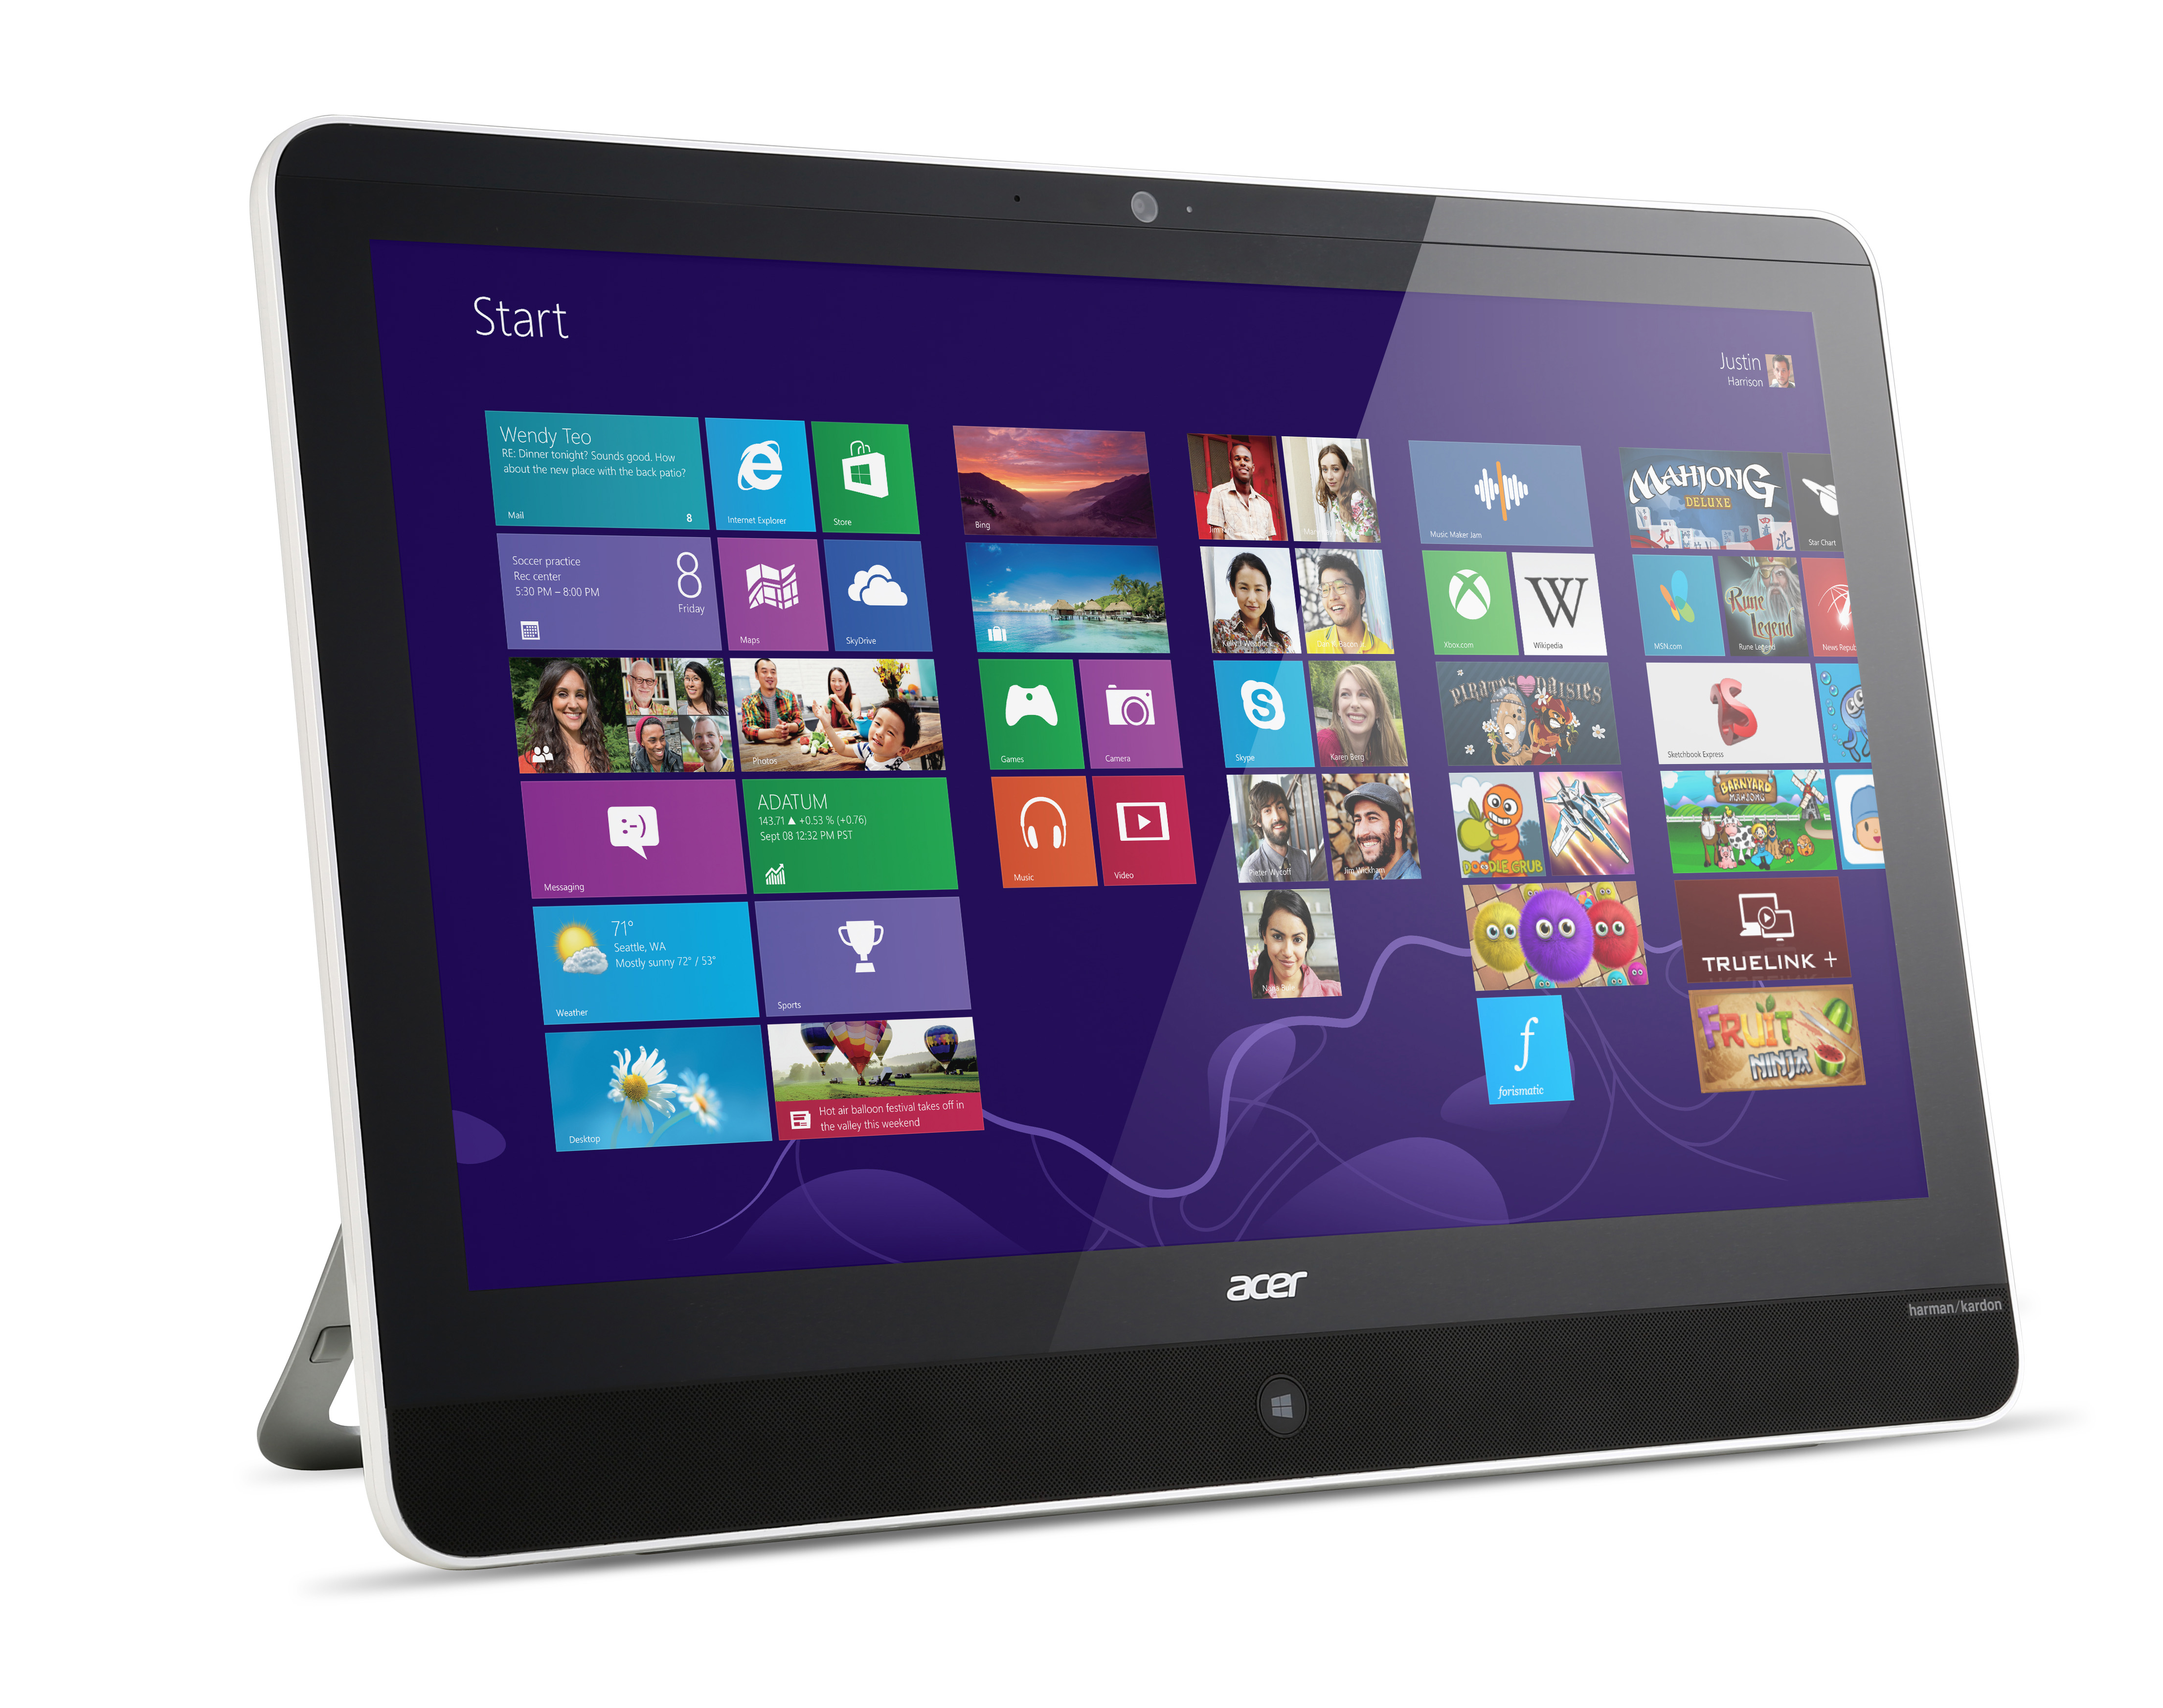 1080p Windows 8.1 Tablet Between Windows 8.1 Tablet